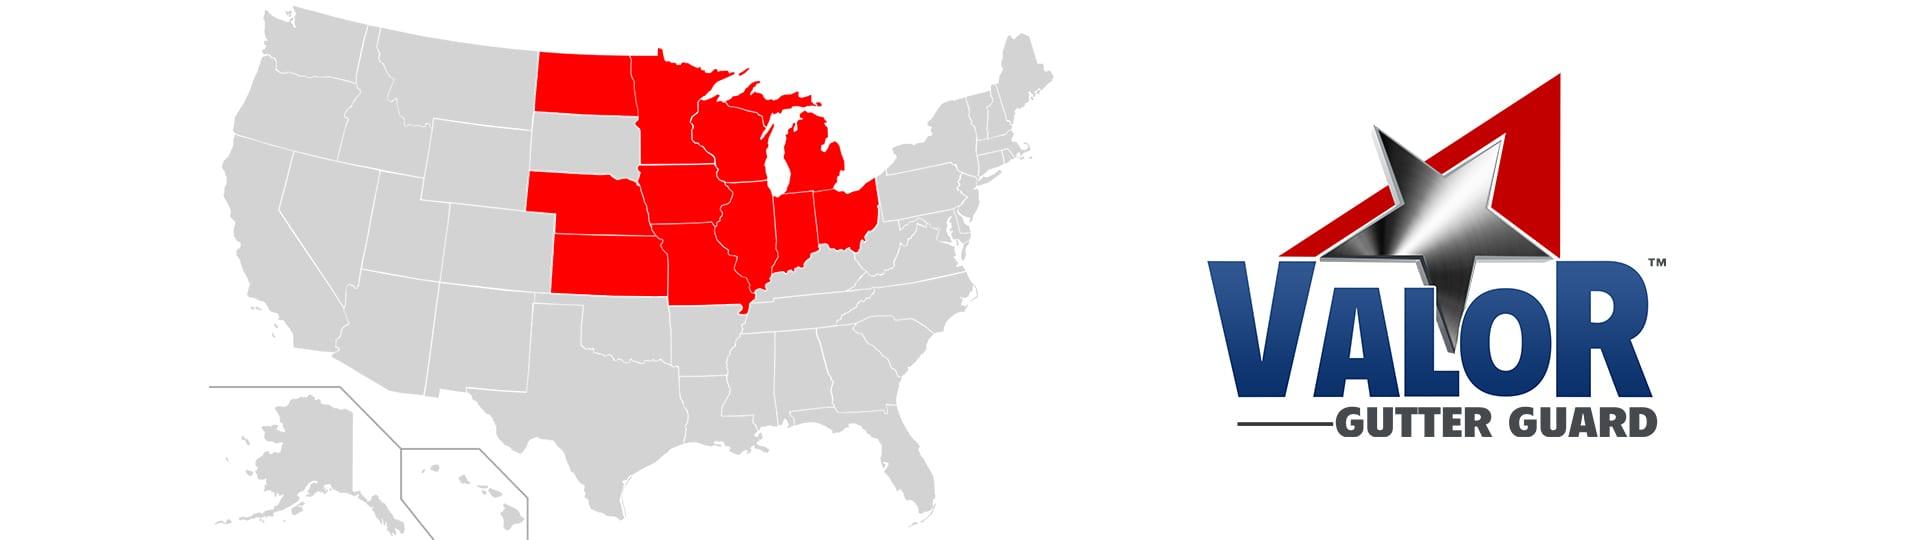 MidwestStatesHeader1910